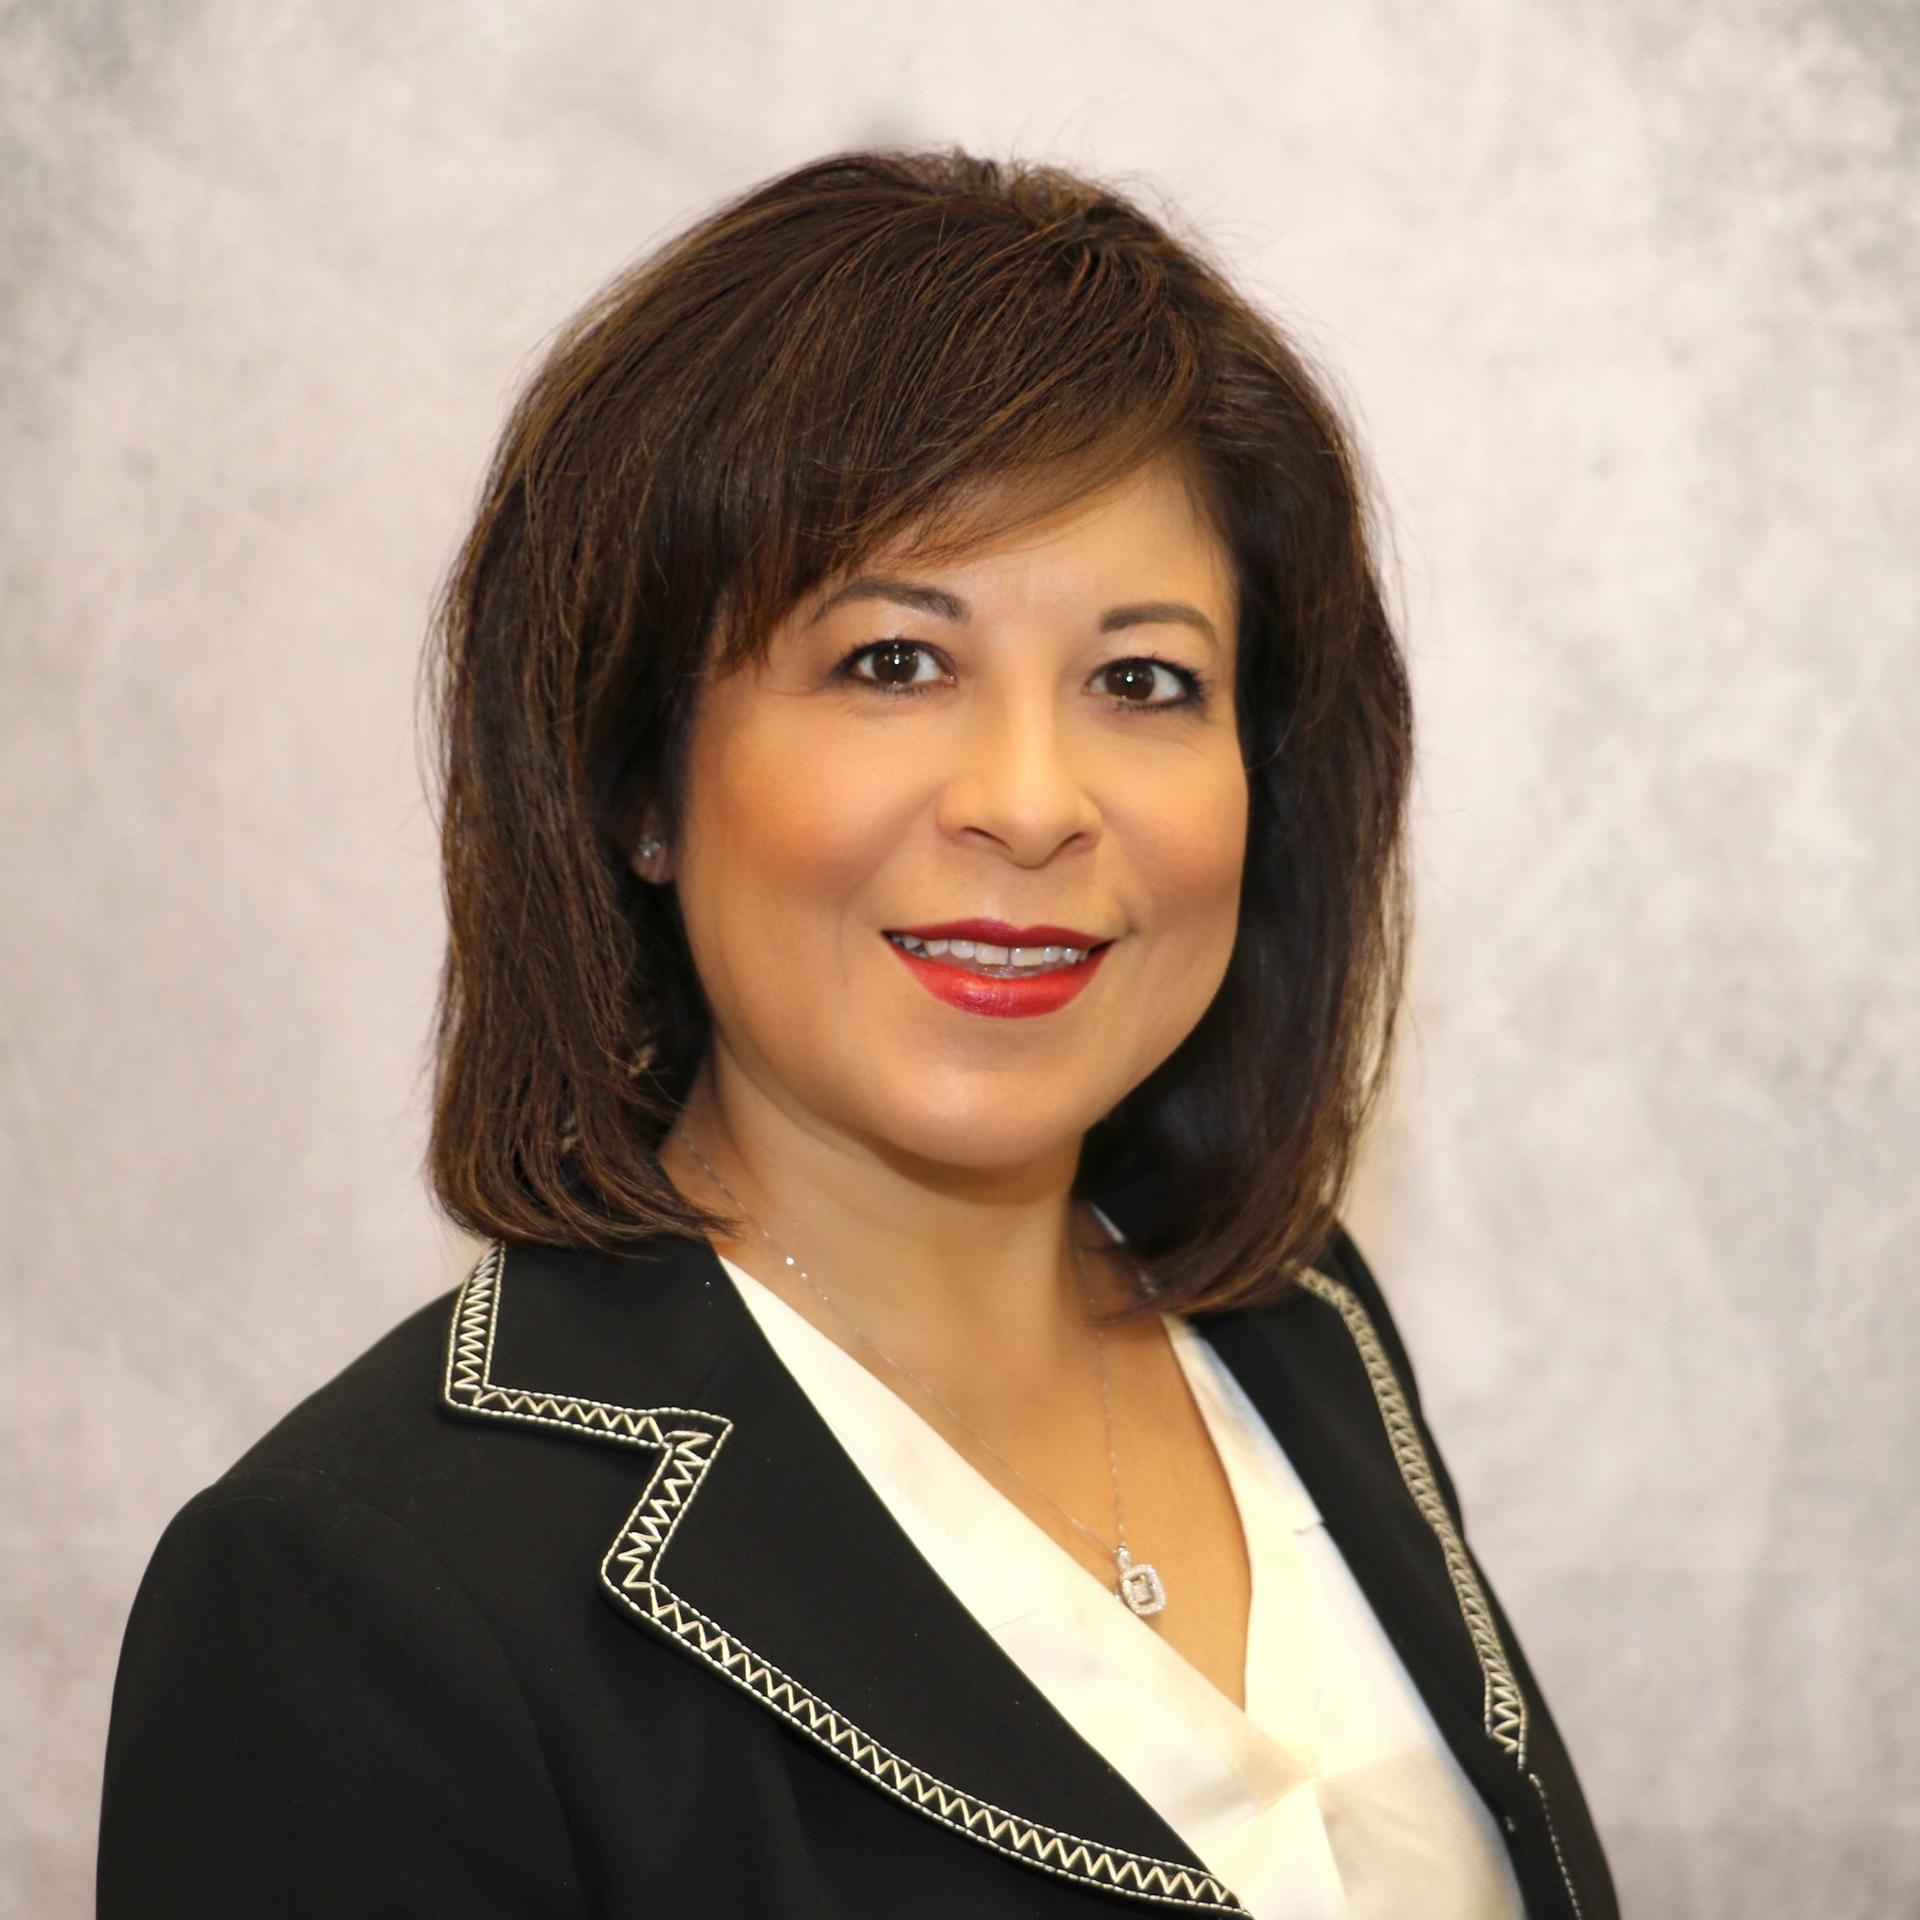 Dr. Altagracia Guerrero